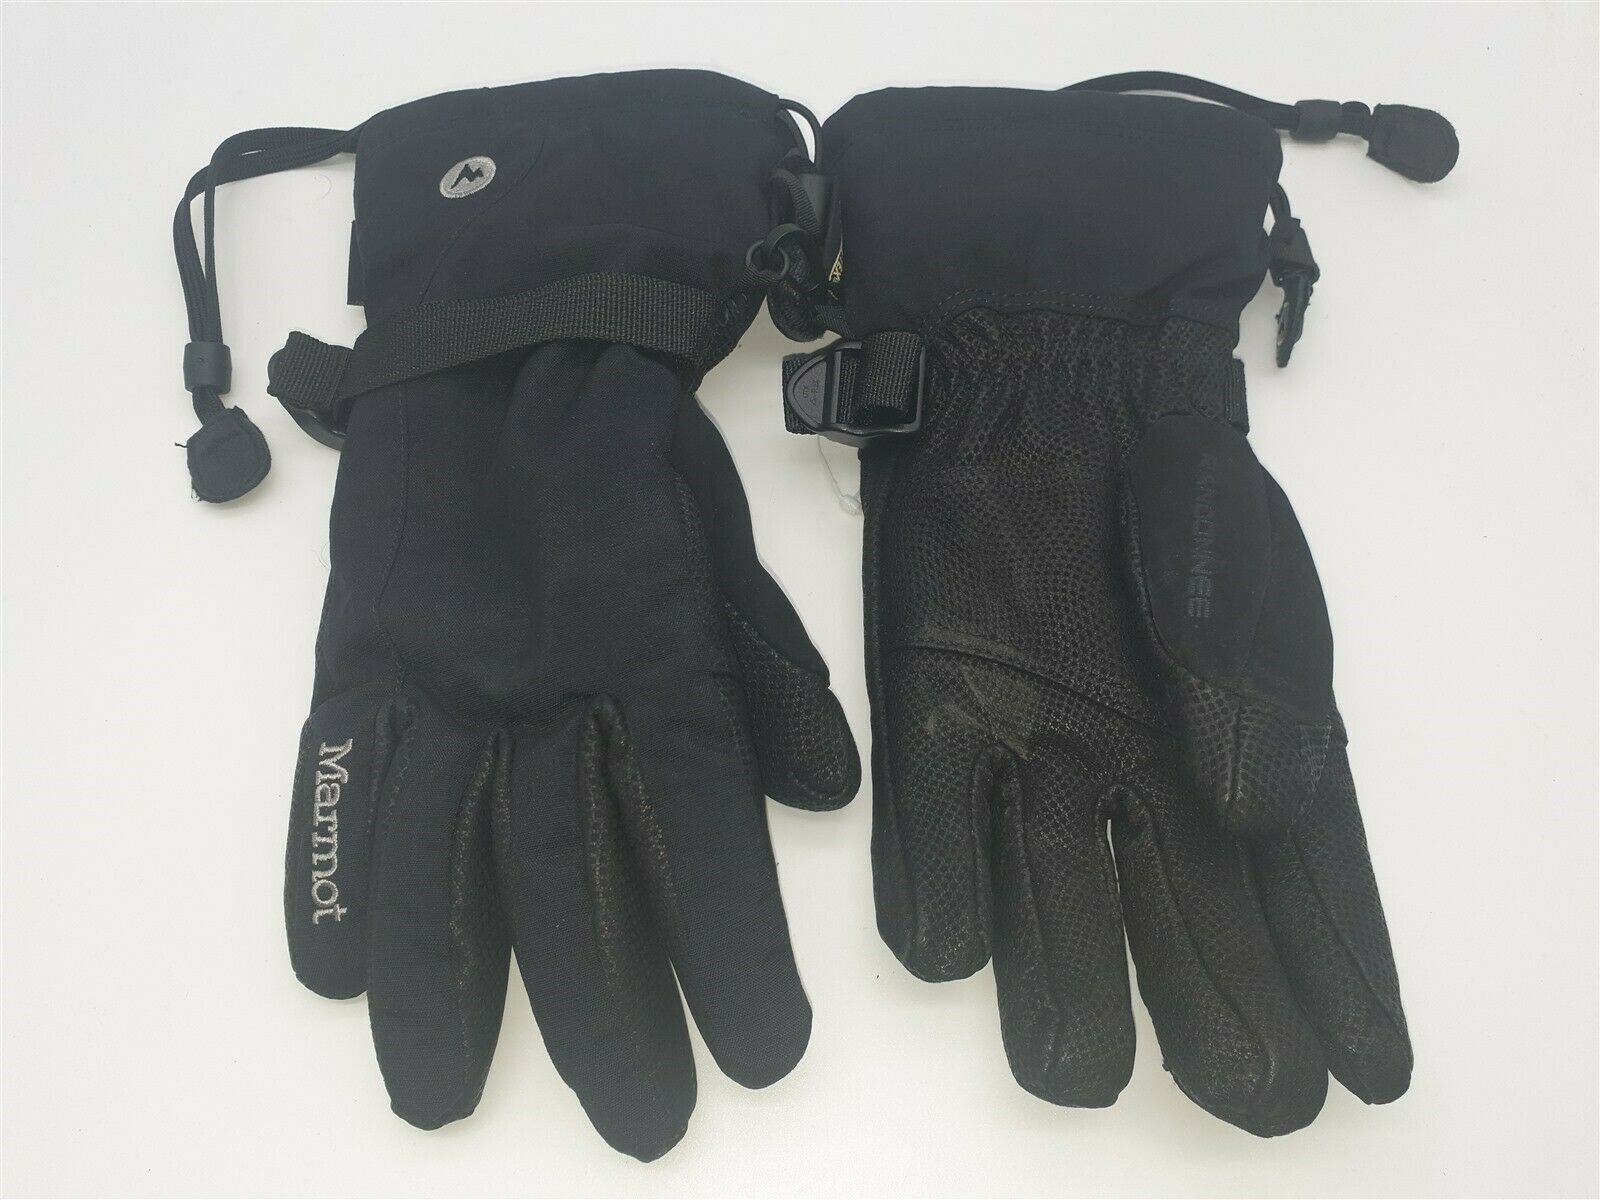 Marmot ReONNEE GORETEX Impermeabile da Sci Snowtavola guanti neri da donna MEDIUM